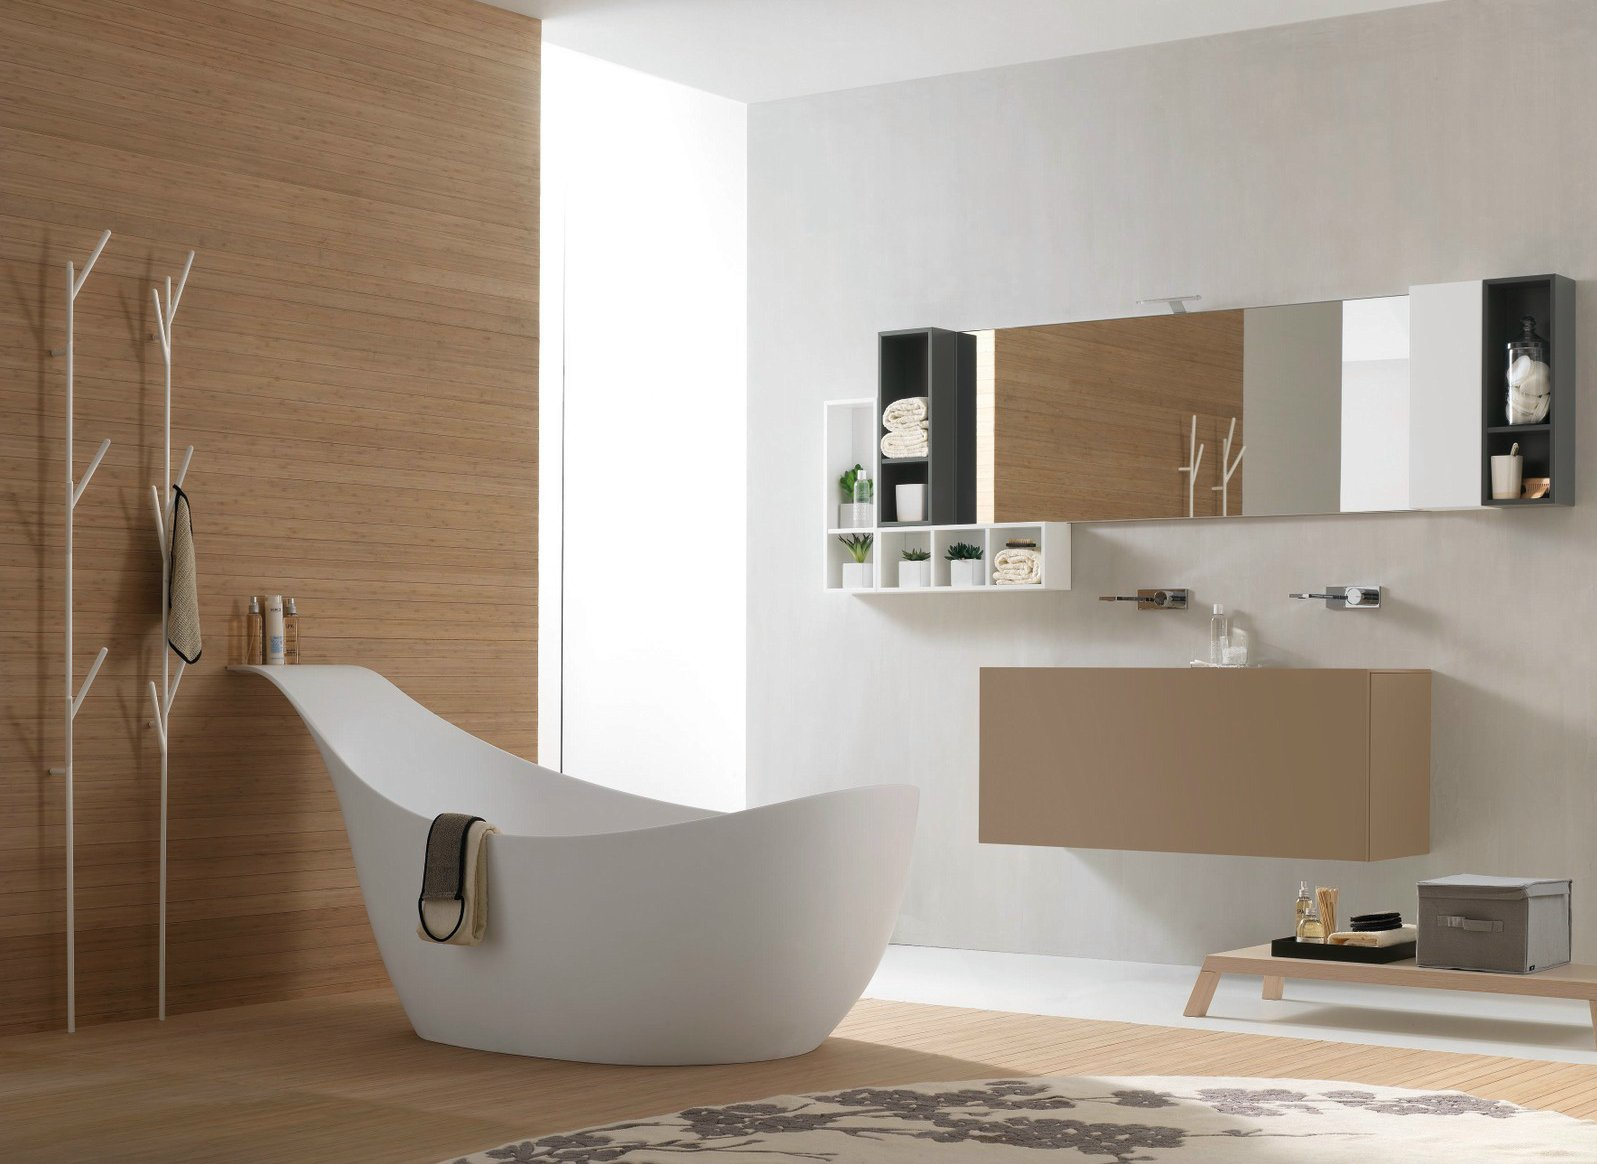 Salle de bains compl te canestro composition c10 for Tarif salle de bain complete